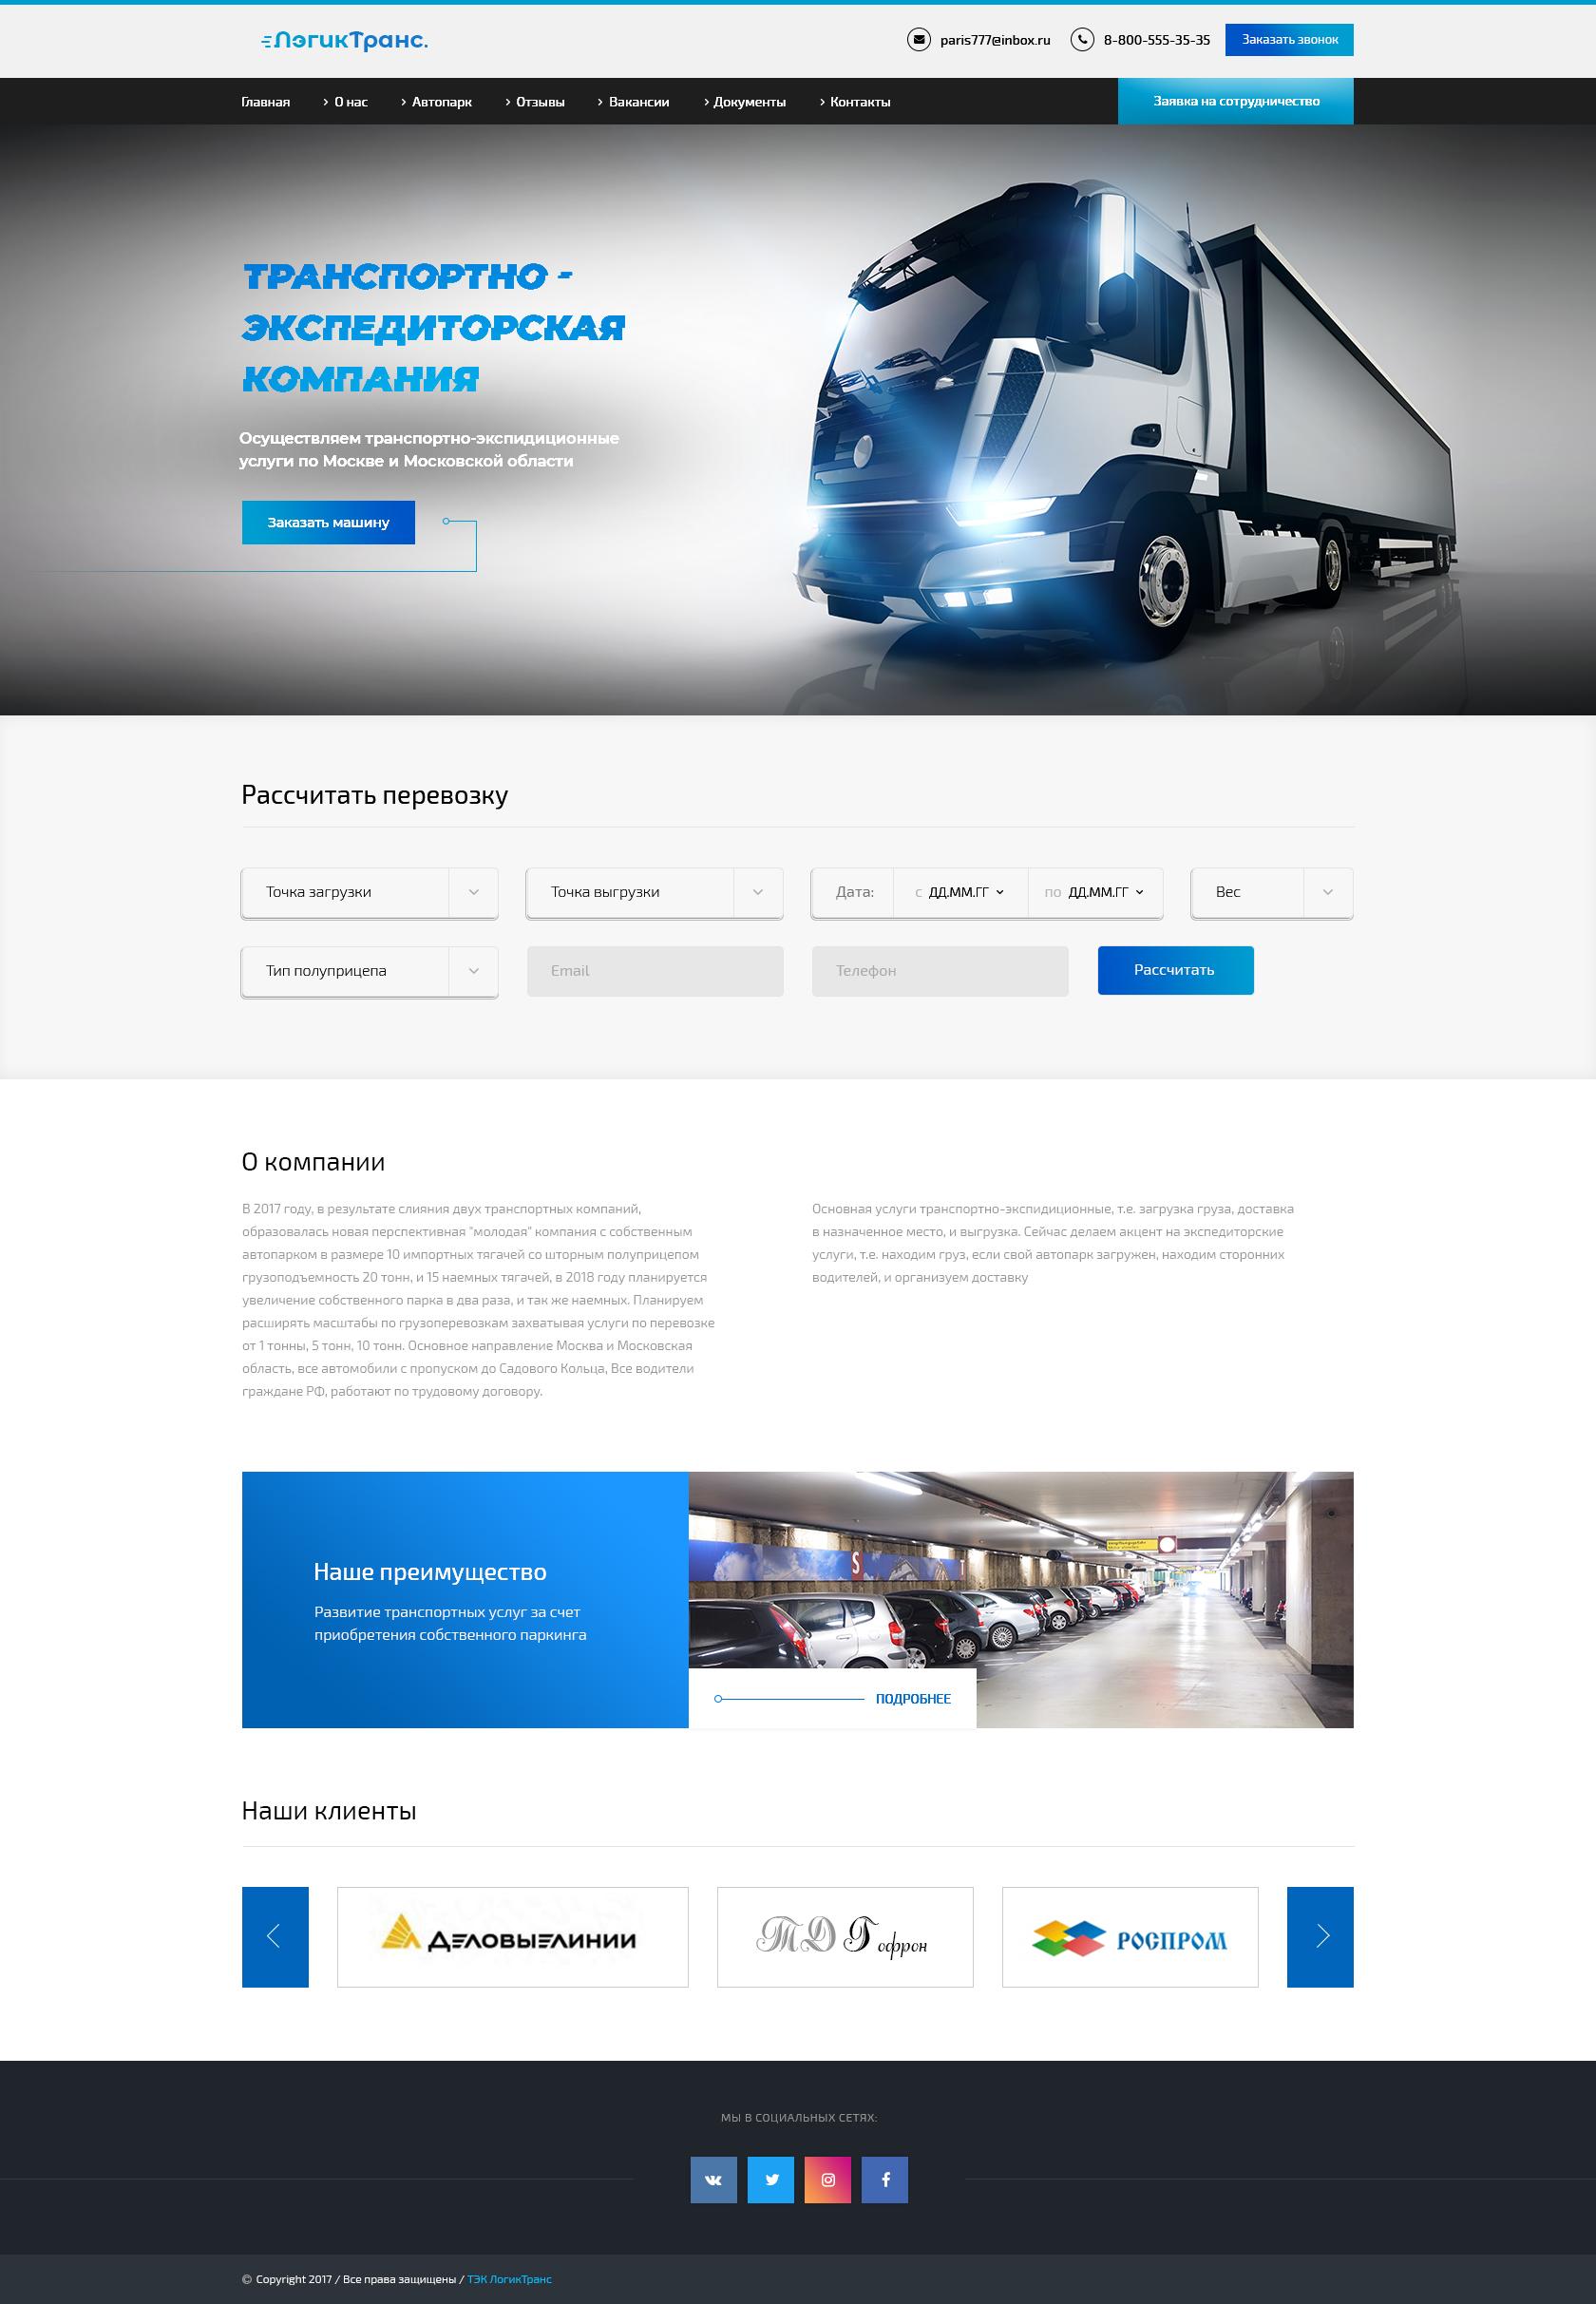 Дизайн сайта транспортно-экспедиторской компании ЛогикТранс фото f_0005a454984b149b.jpg